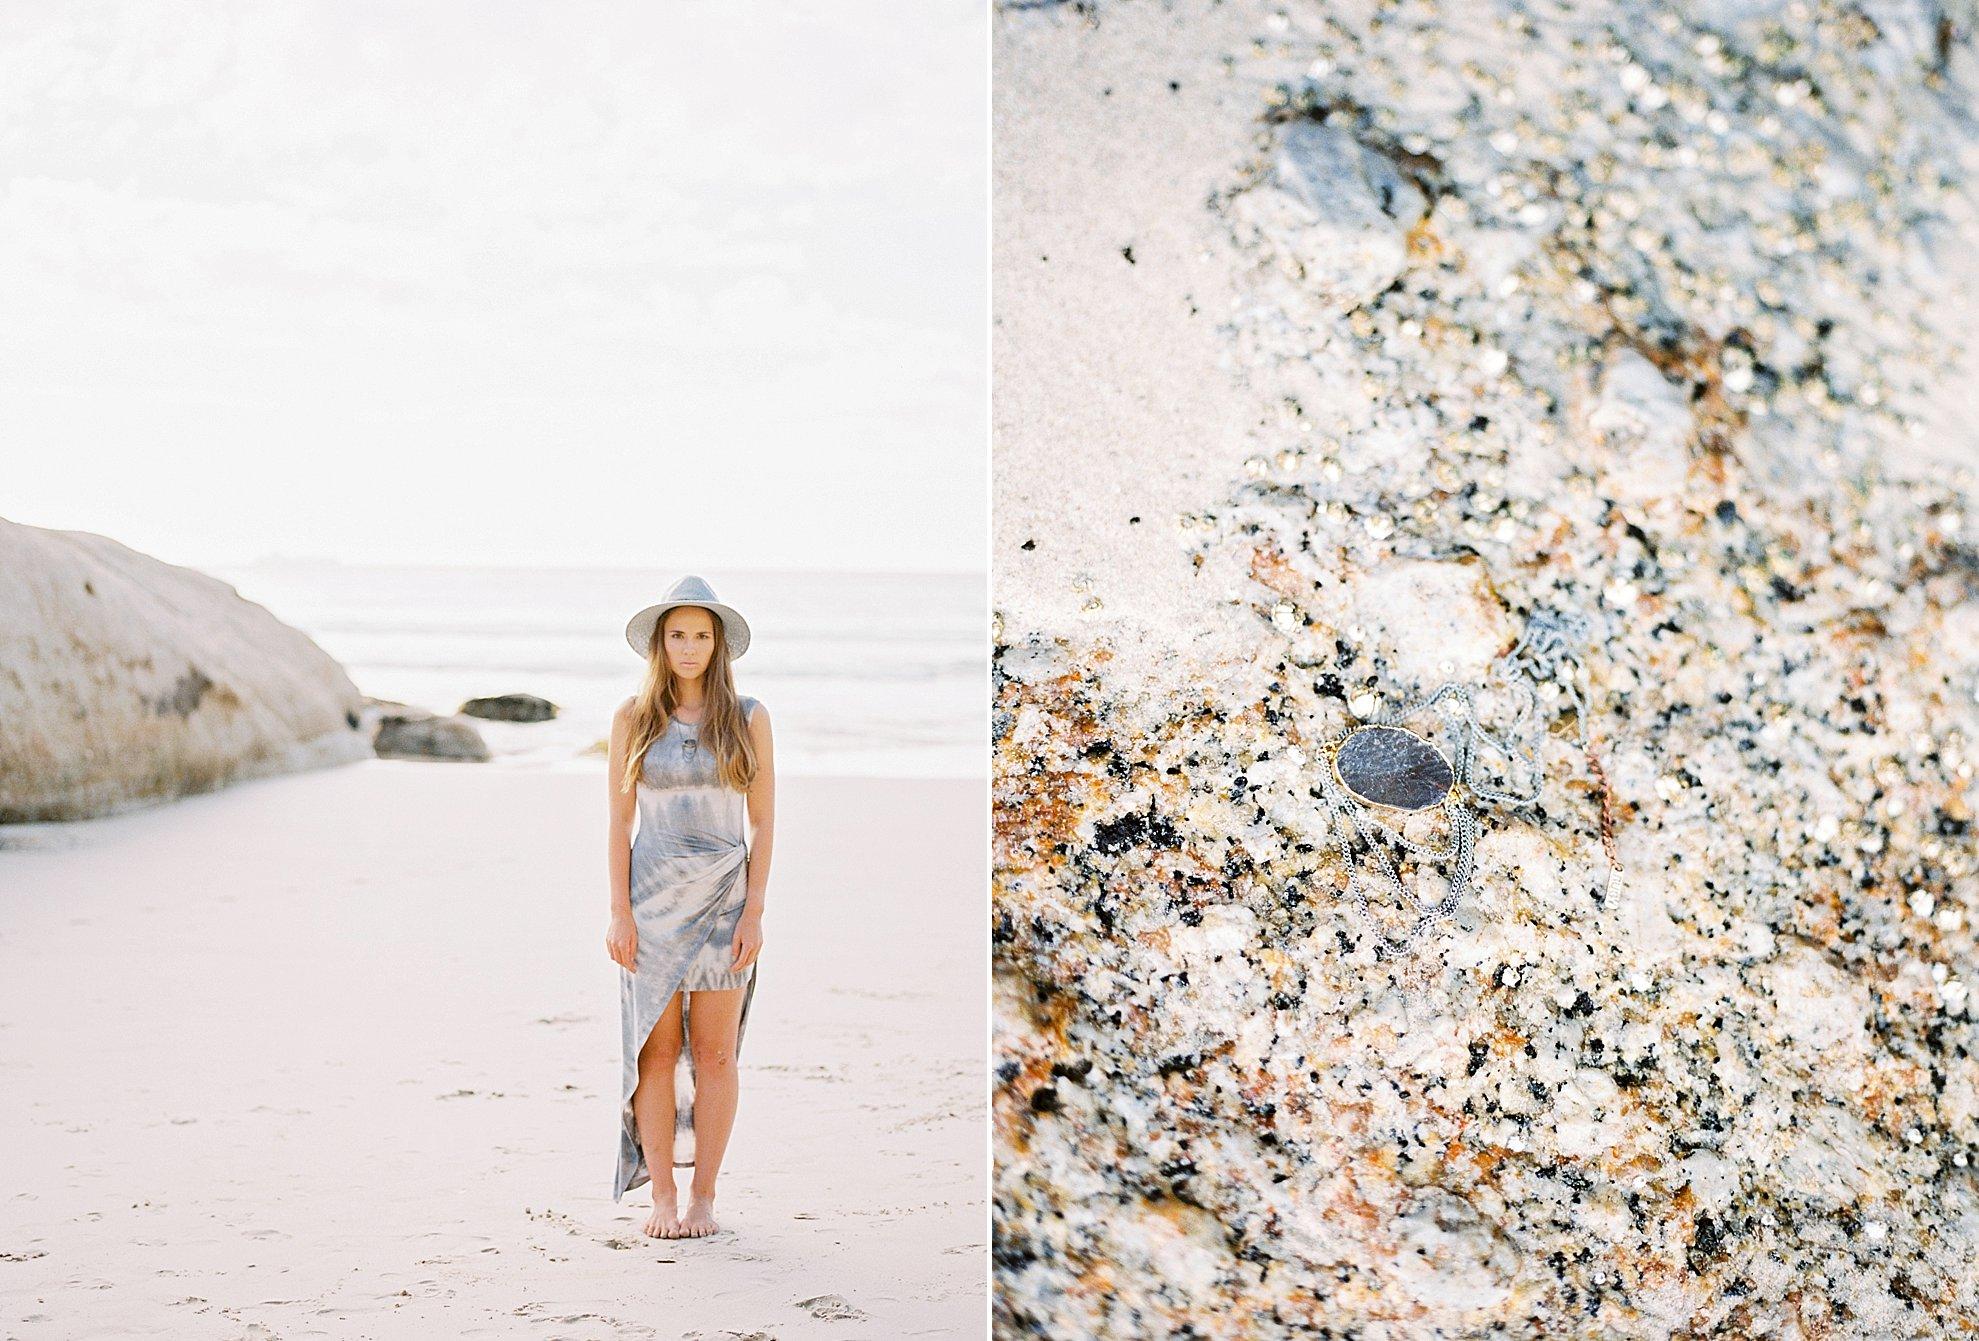 Amanda-Drost-photography-editorial-South-Africa-fashion-fotografie-mode-Zuid-Afrika_0002.jpg